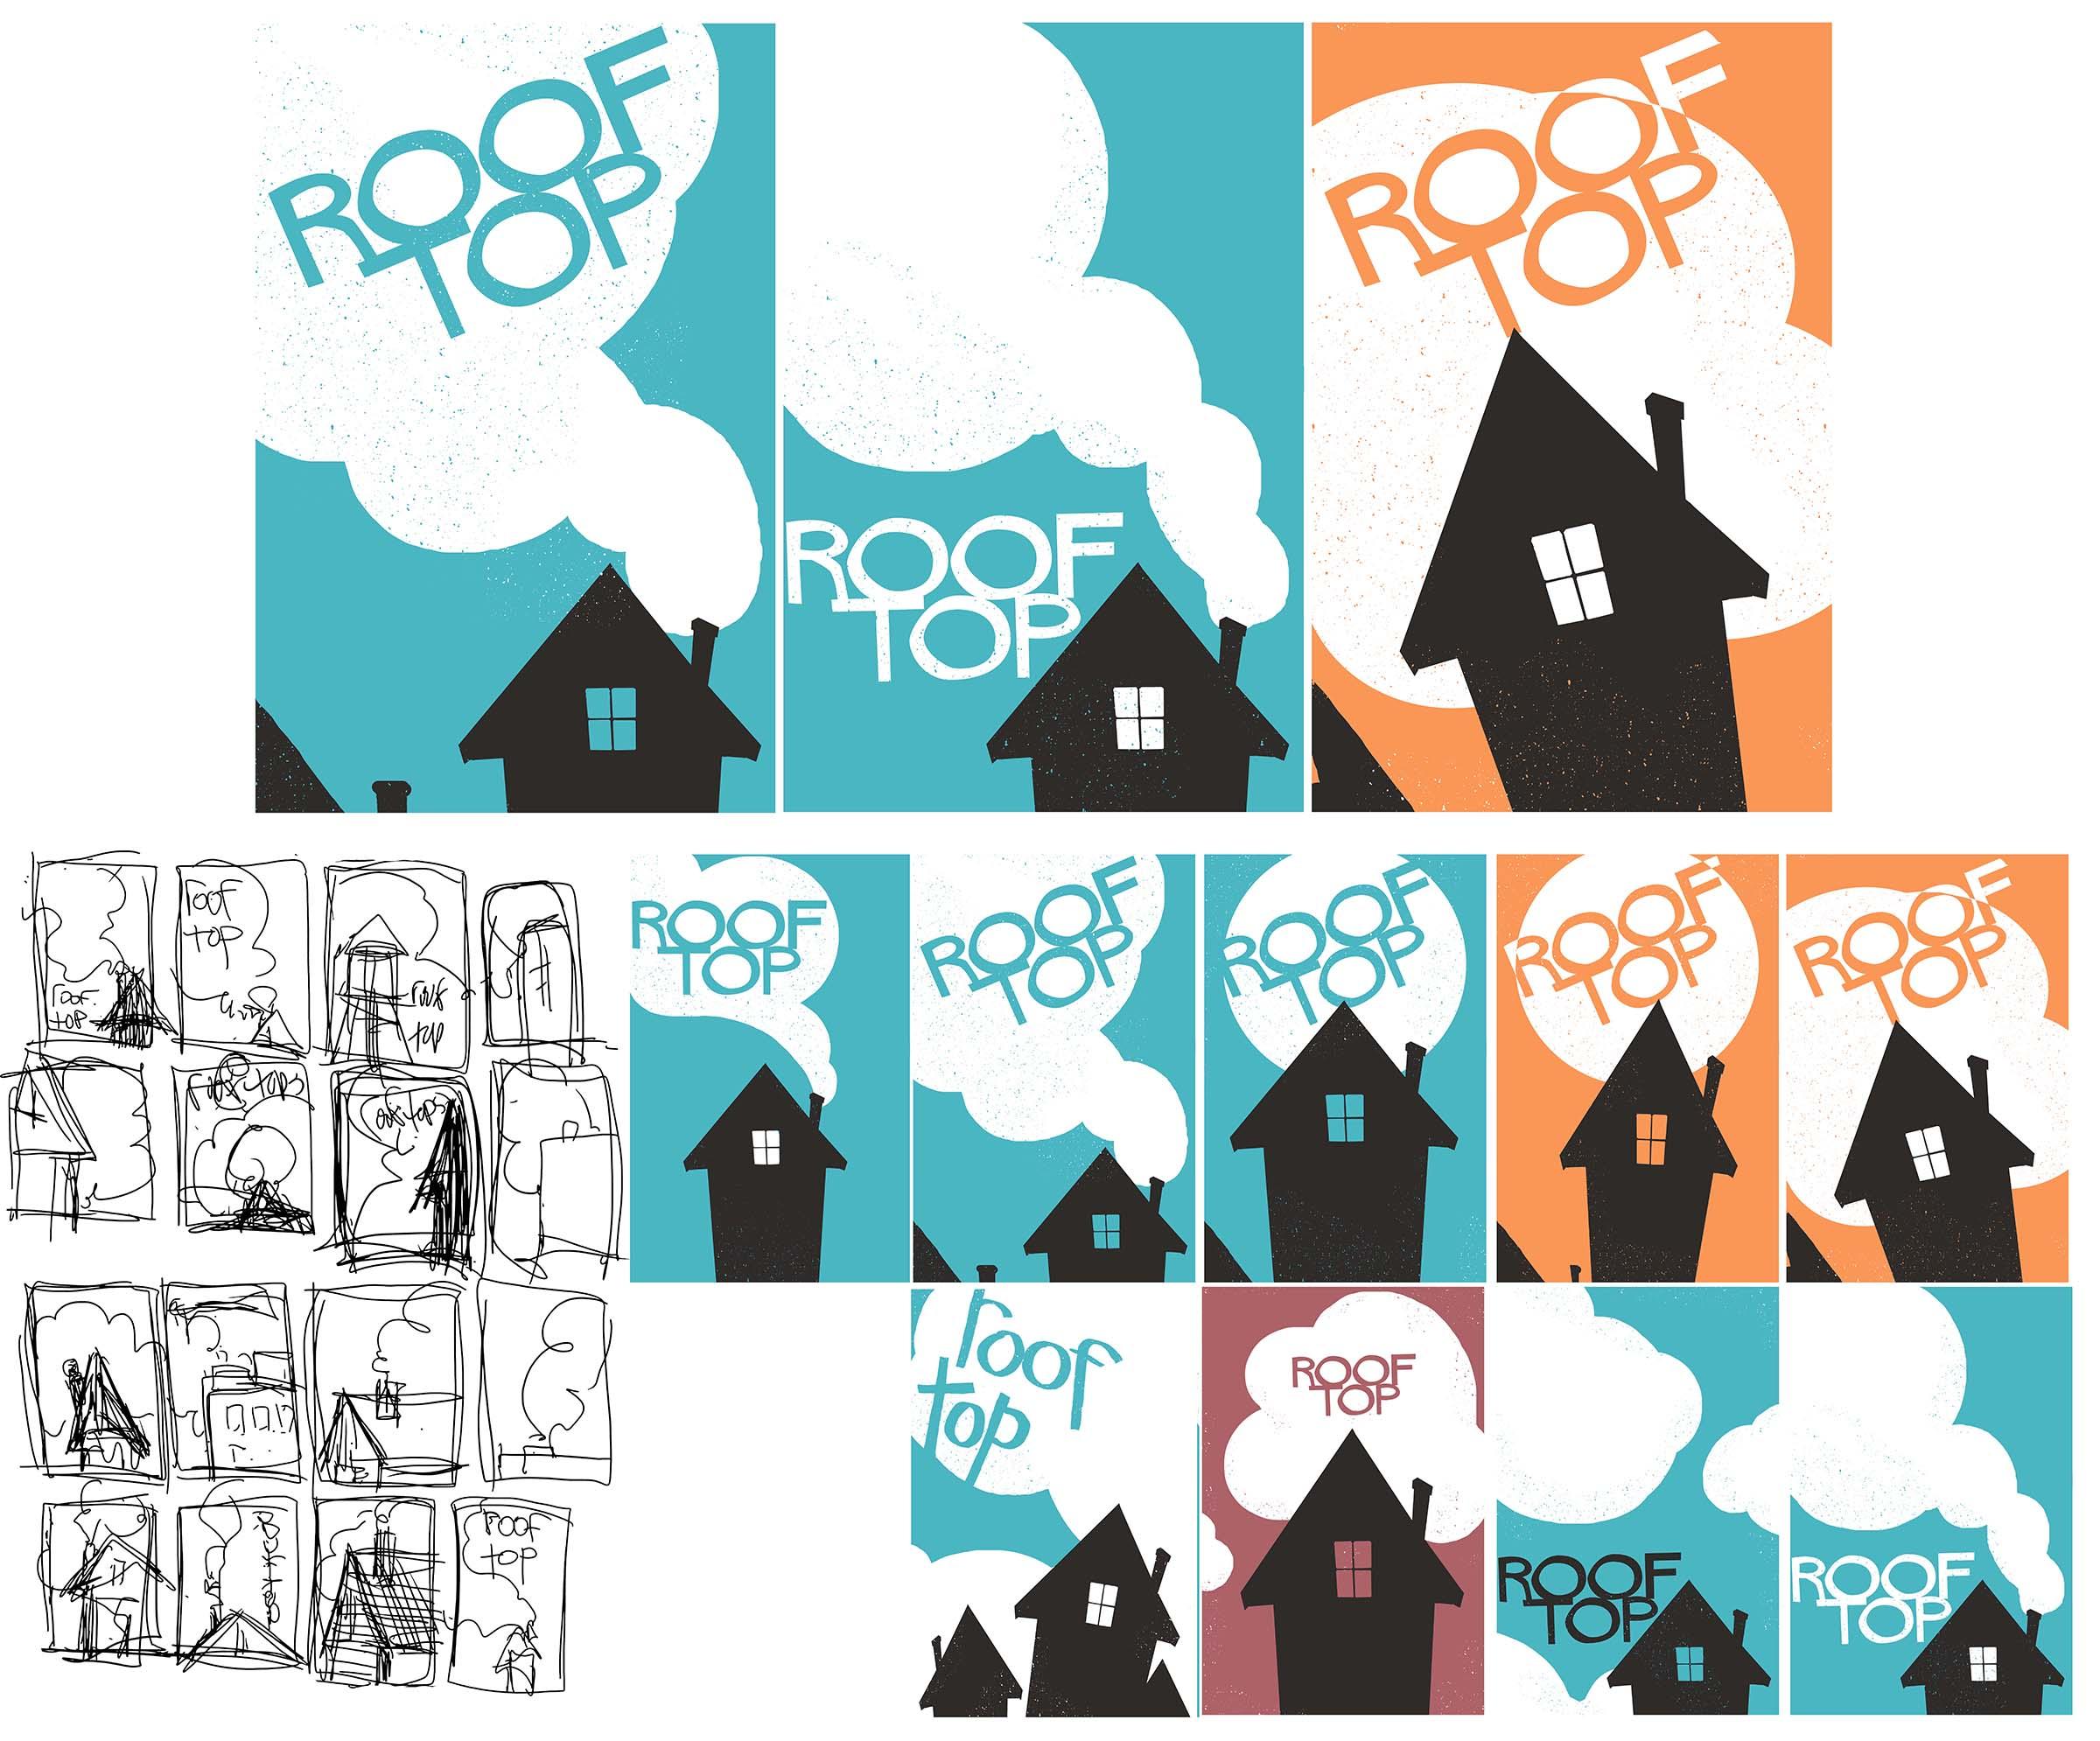 RoofTop_process.jpg